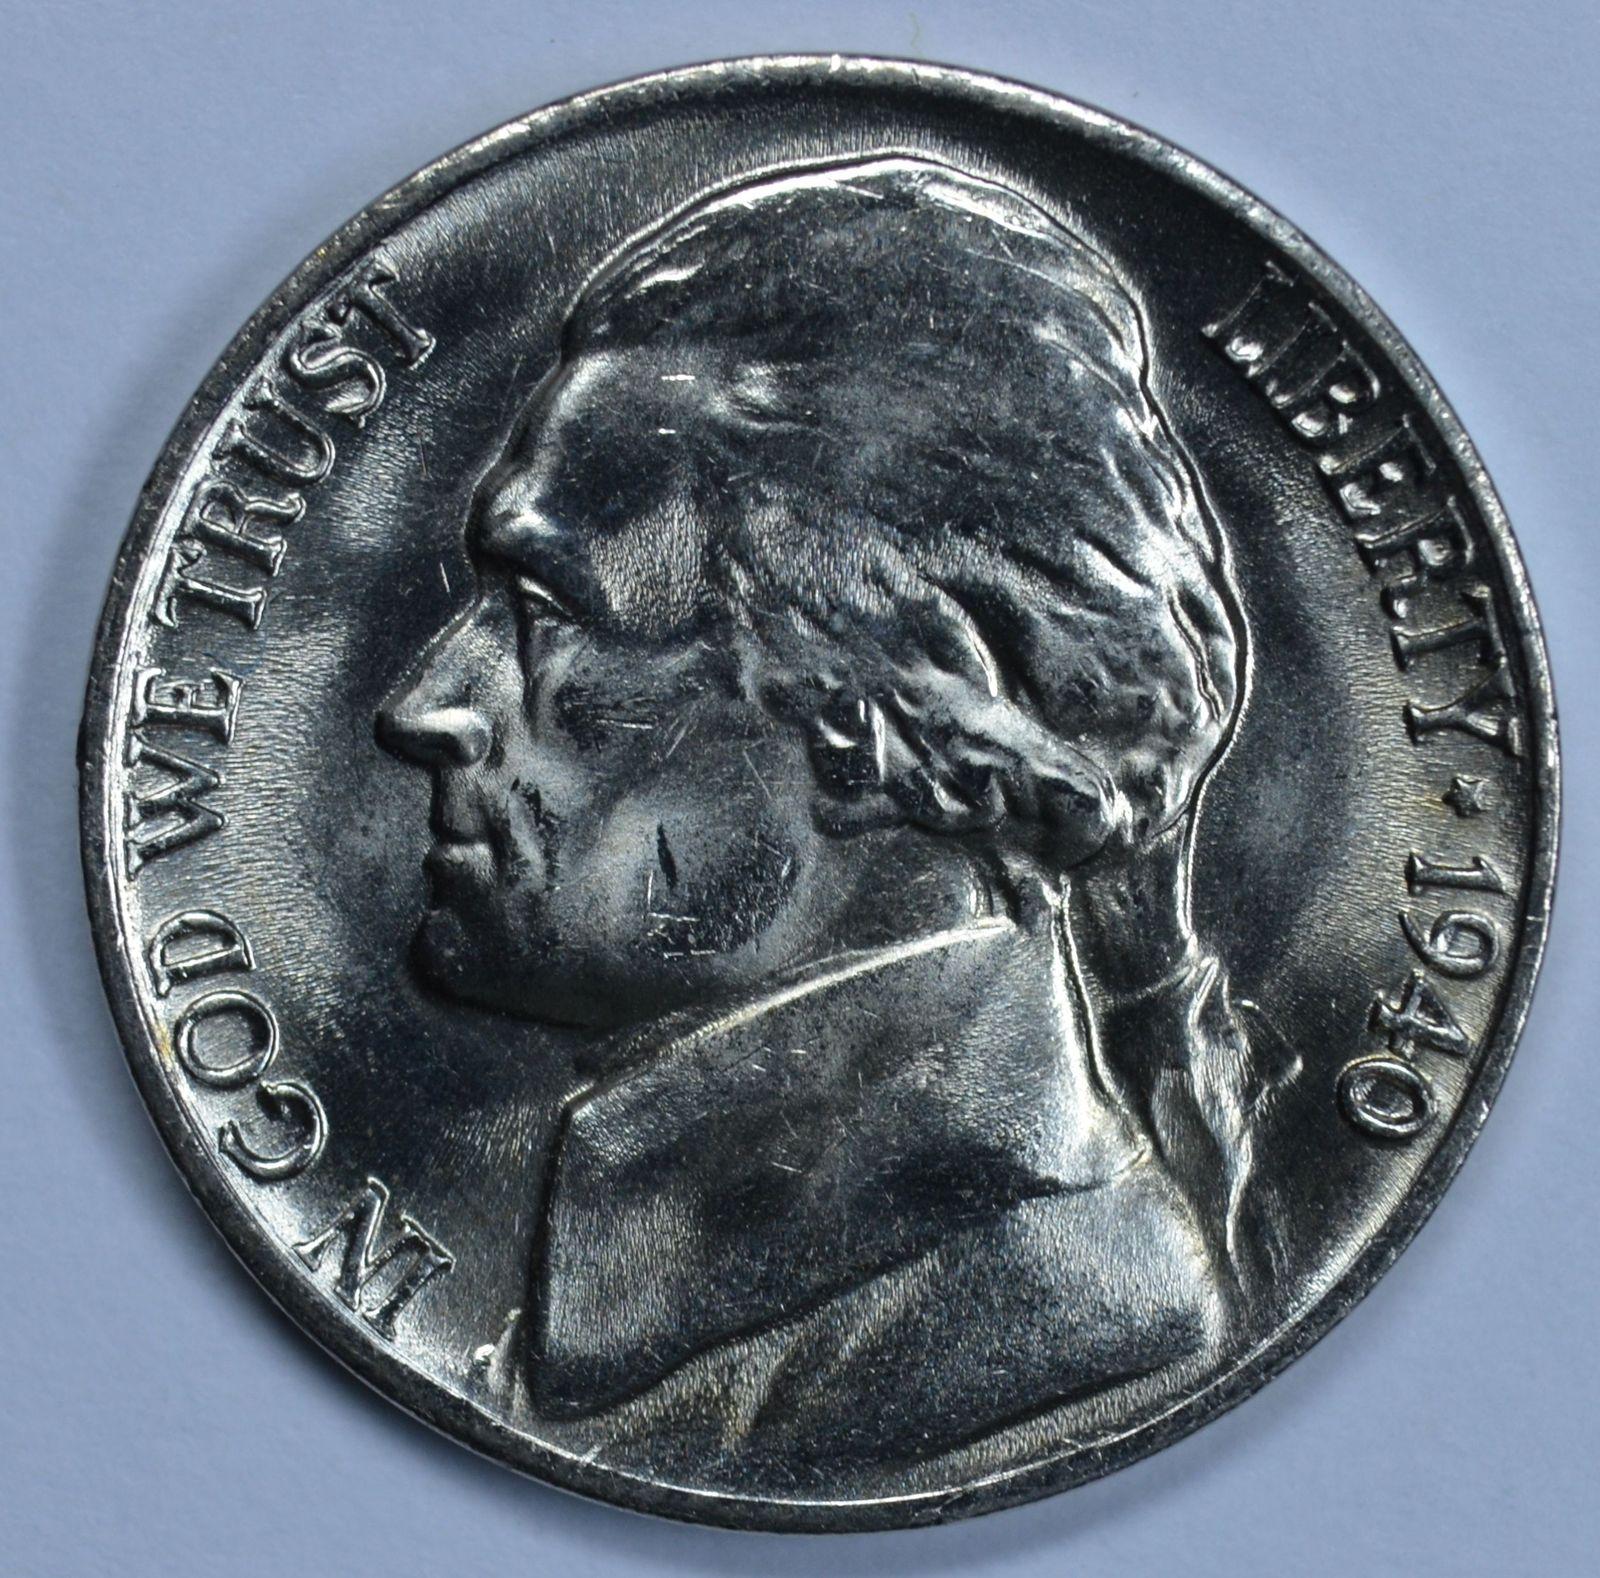 1940 P Jefferson uncirculated nickel BU 5 full steps - $11.50